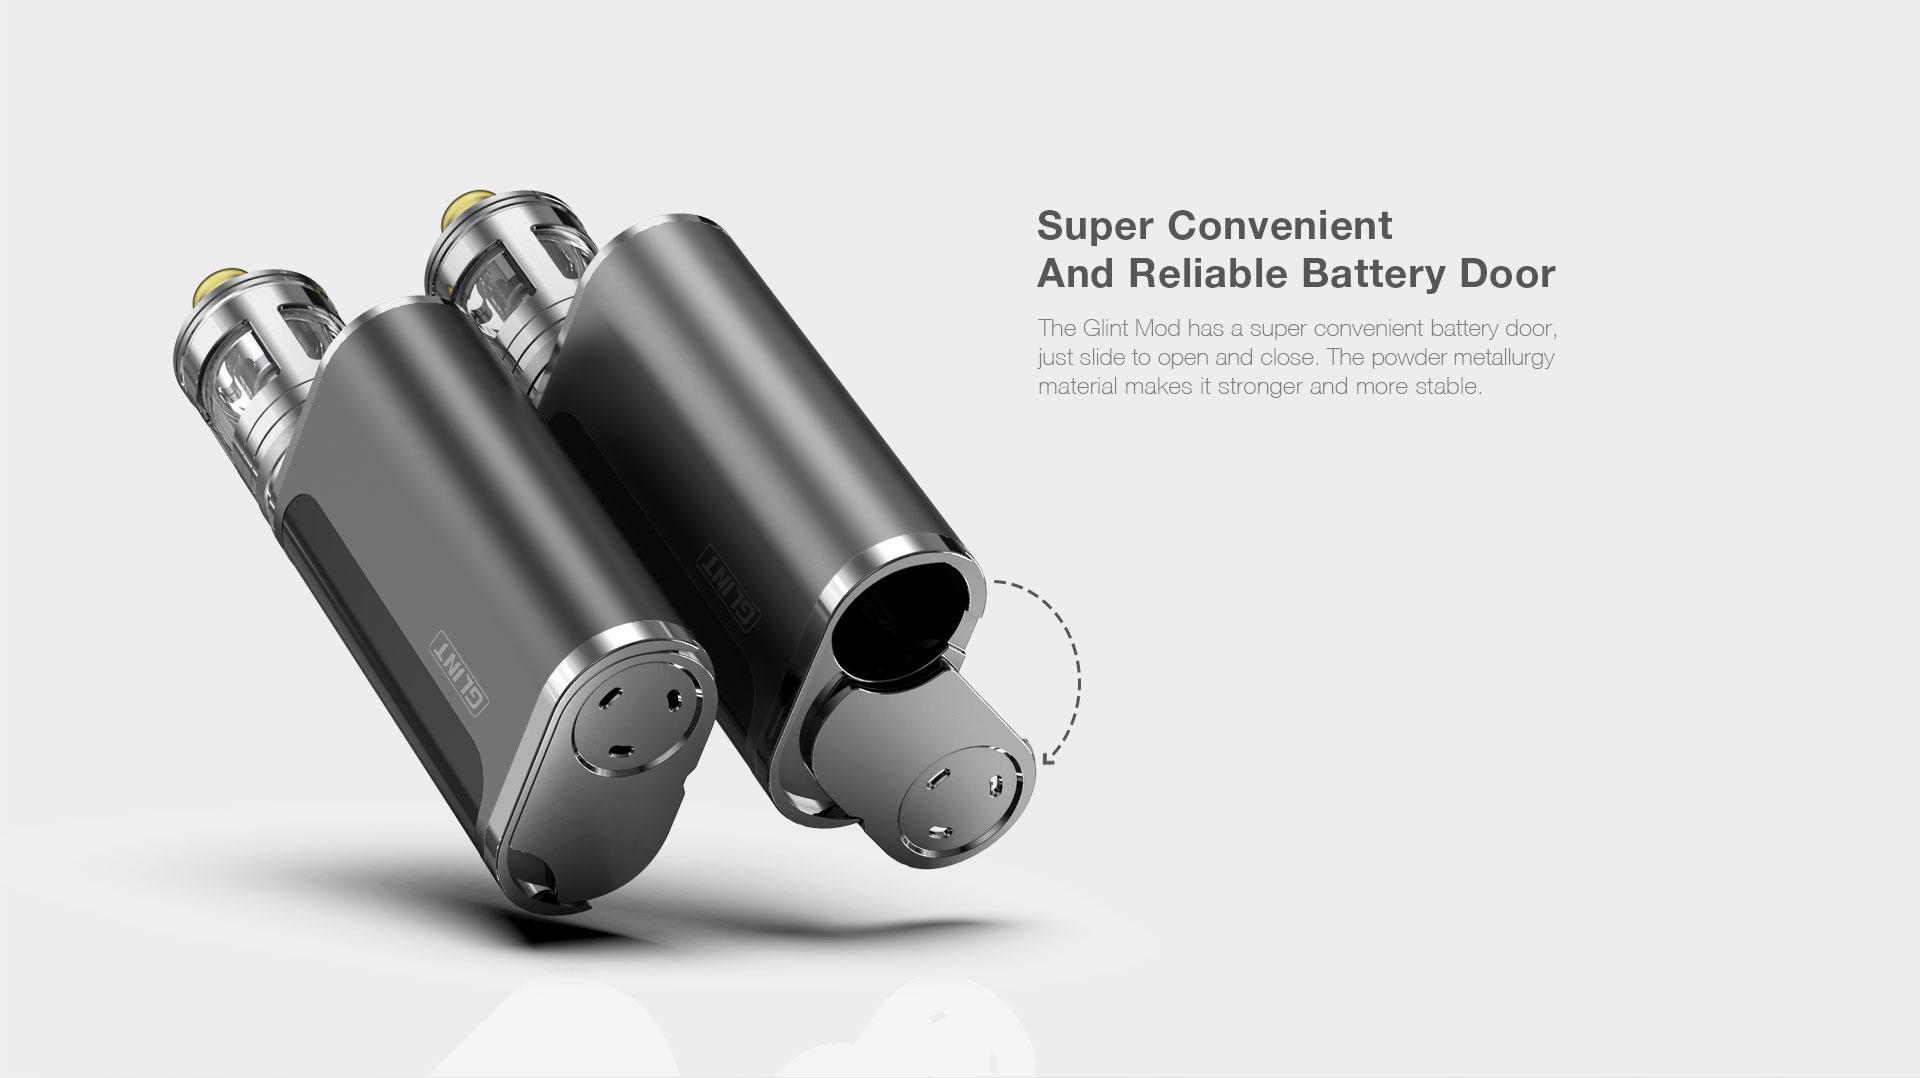 Aspire Glint Mod Convenient And Reliable Battery Door